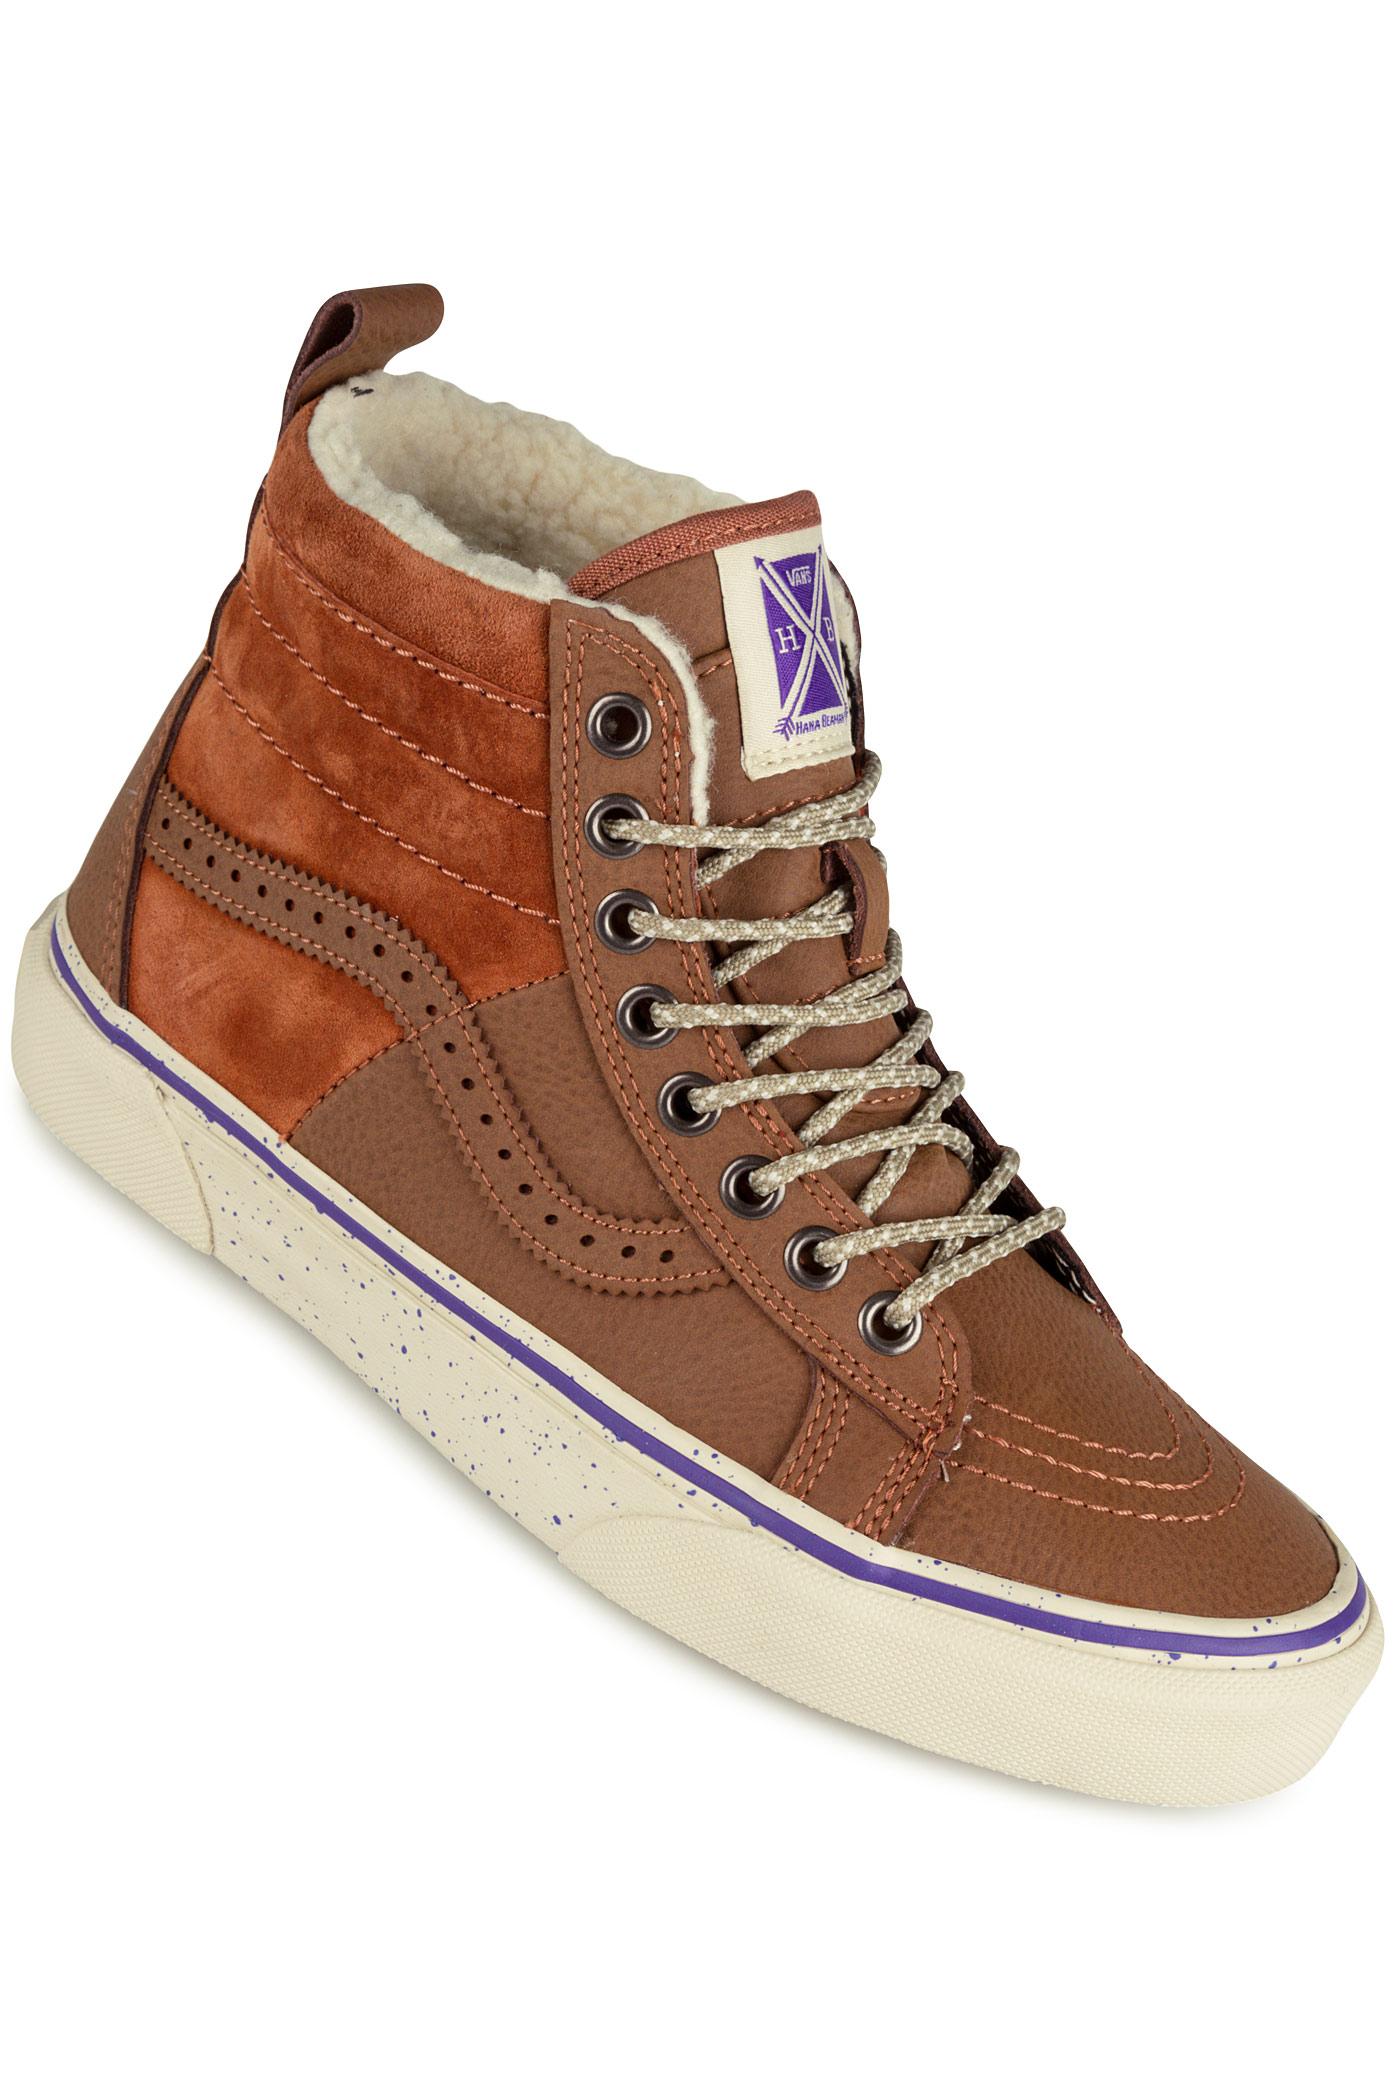 Buy womens brown vans shoes c2c7e0ecb